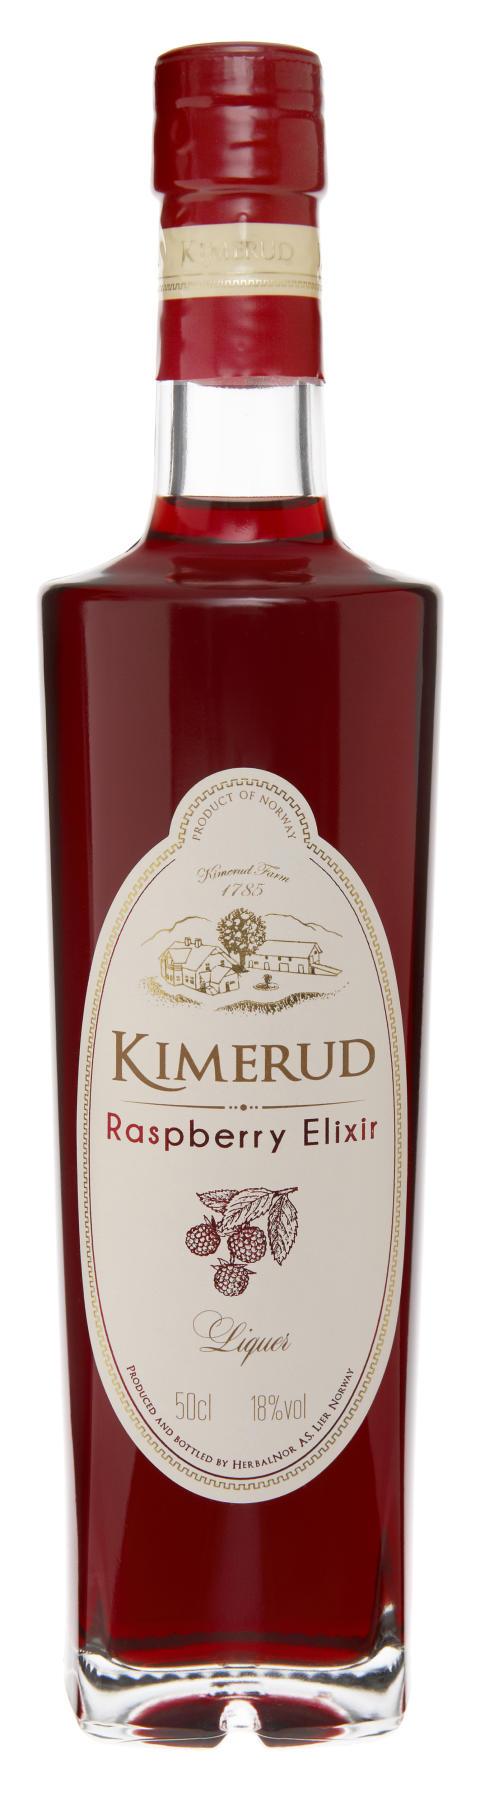 Kimerud Raspberry Elixir